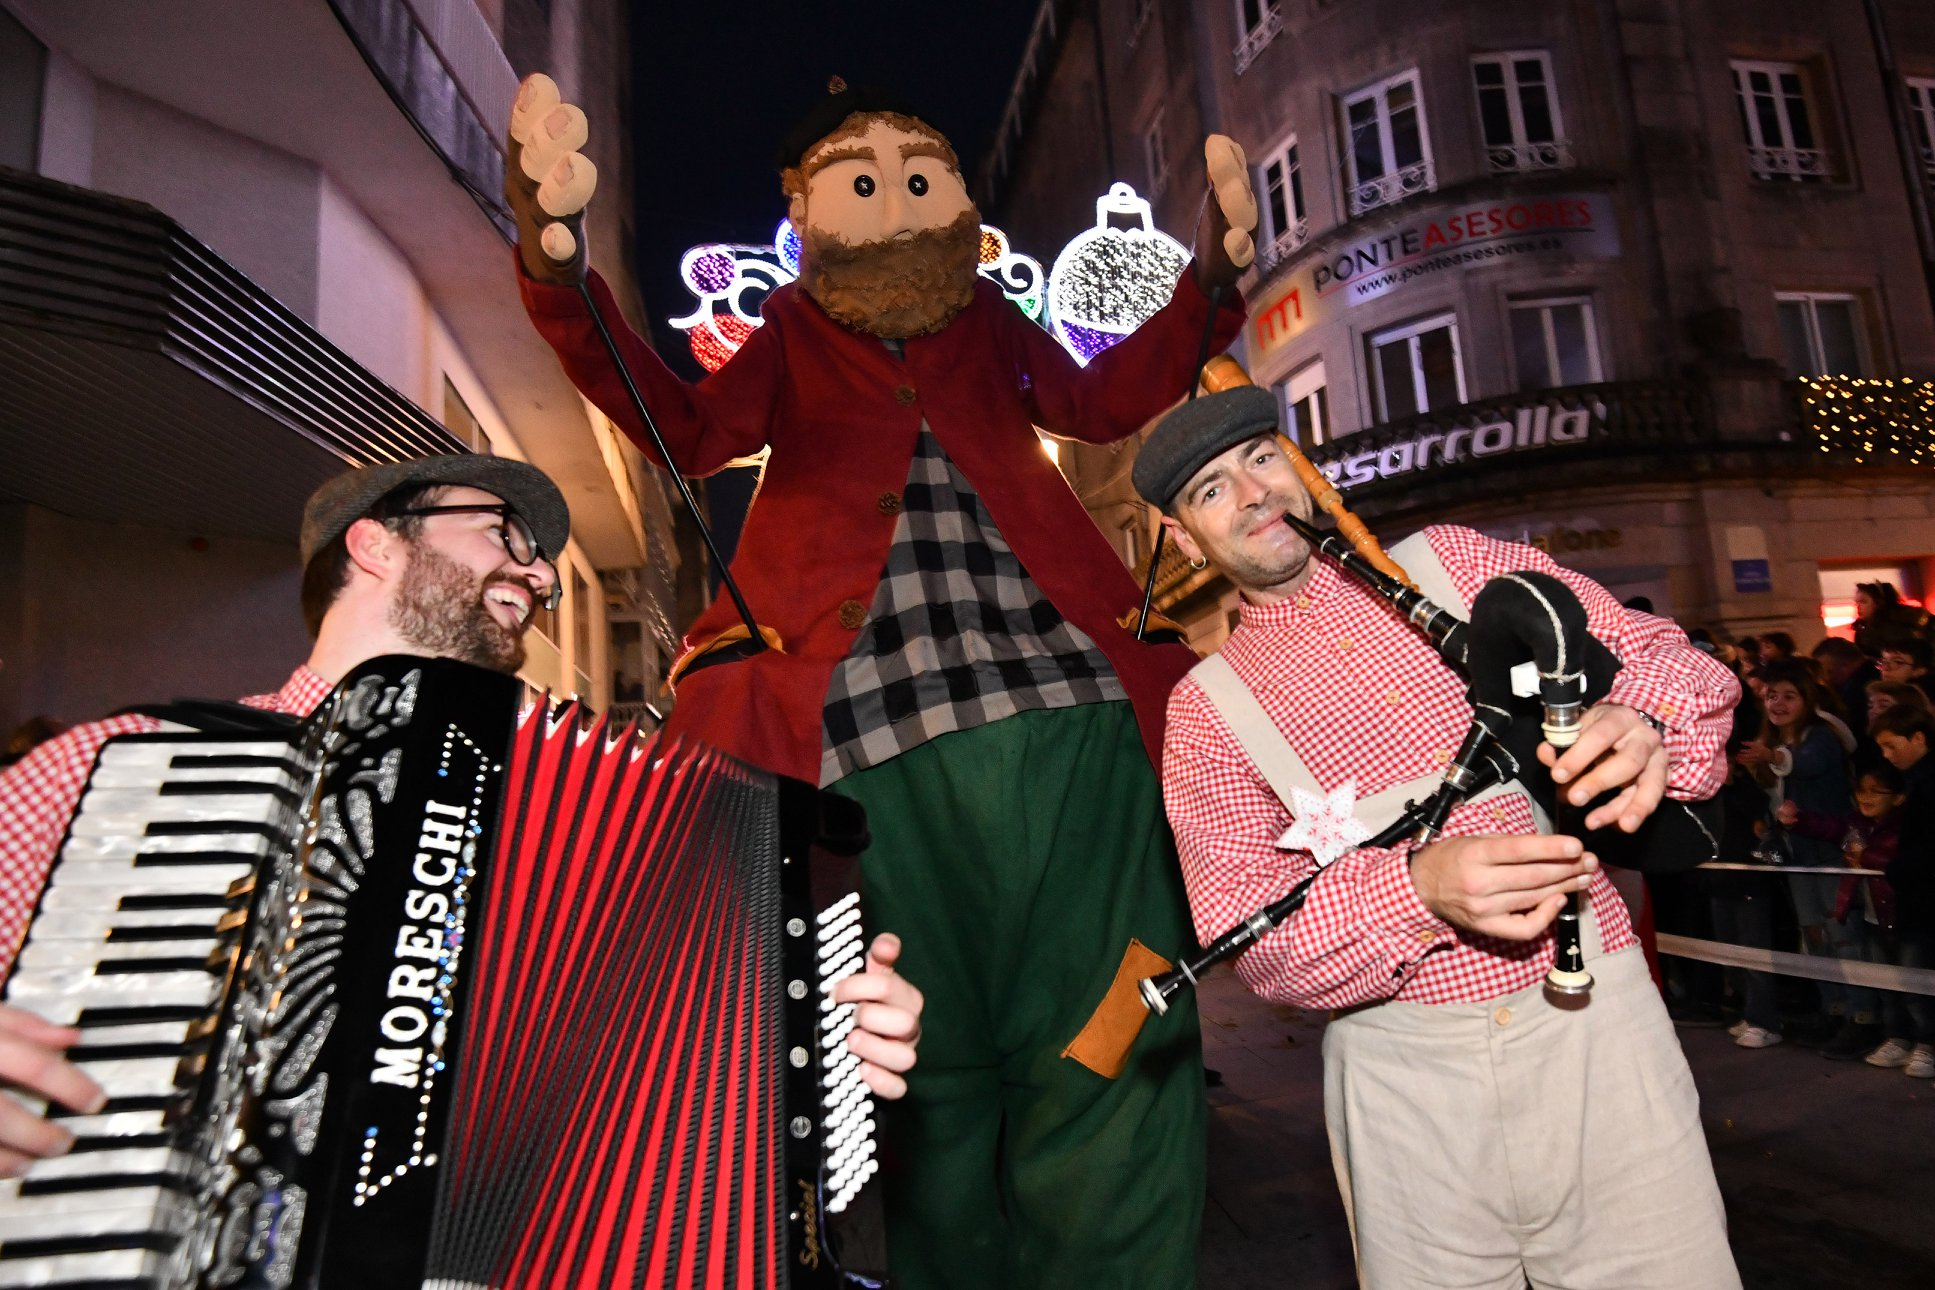 Os Reis Magos en Pontevedra